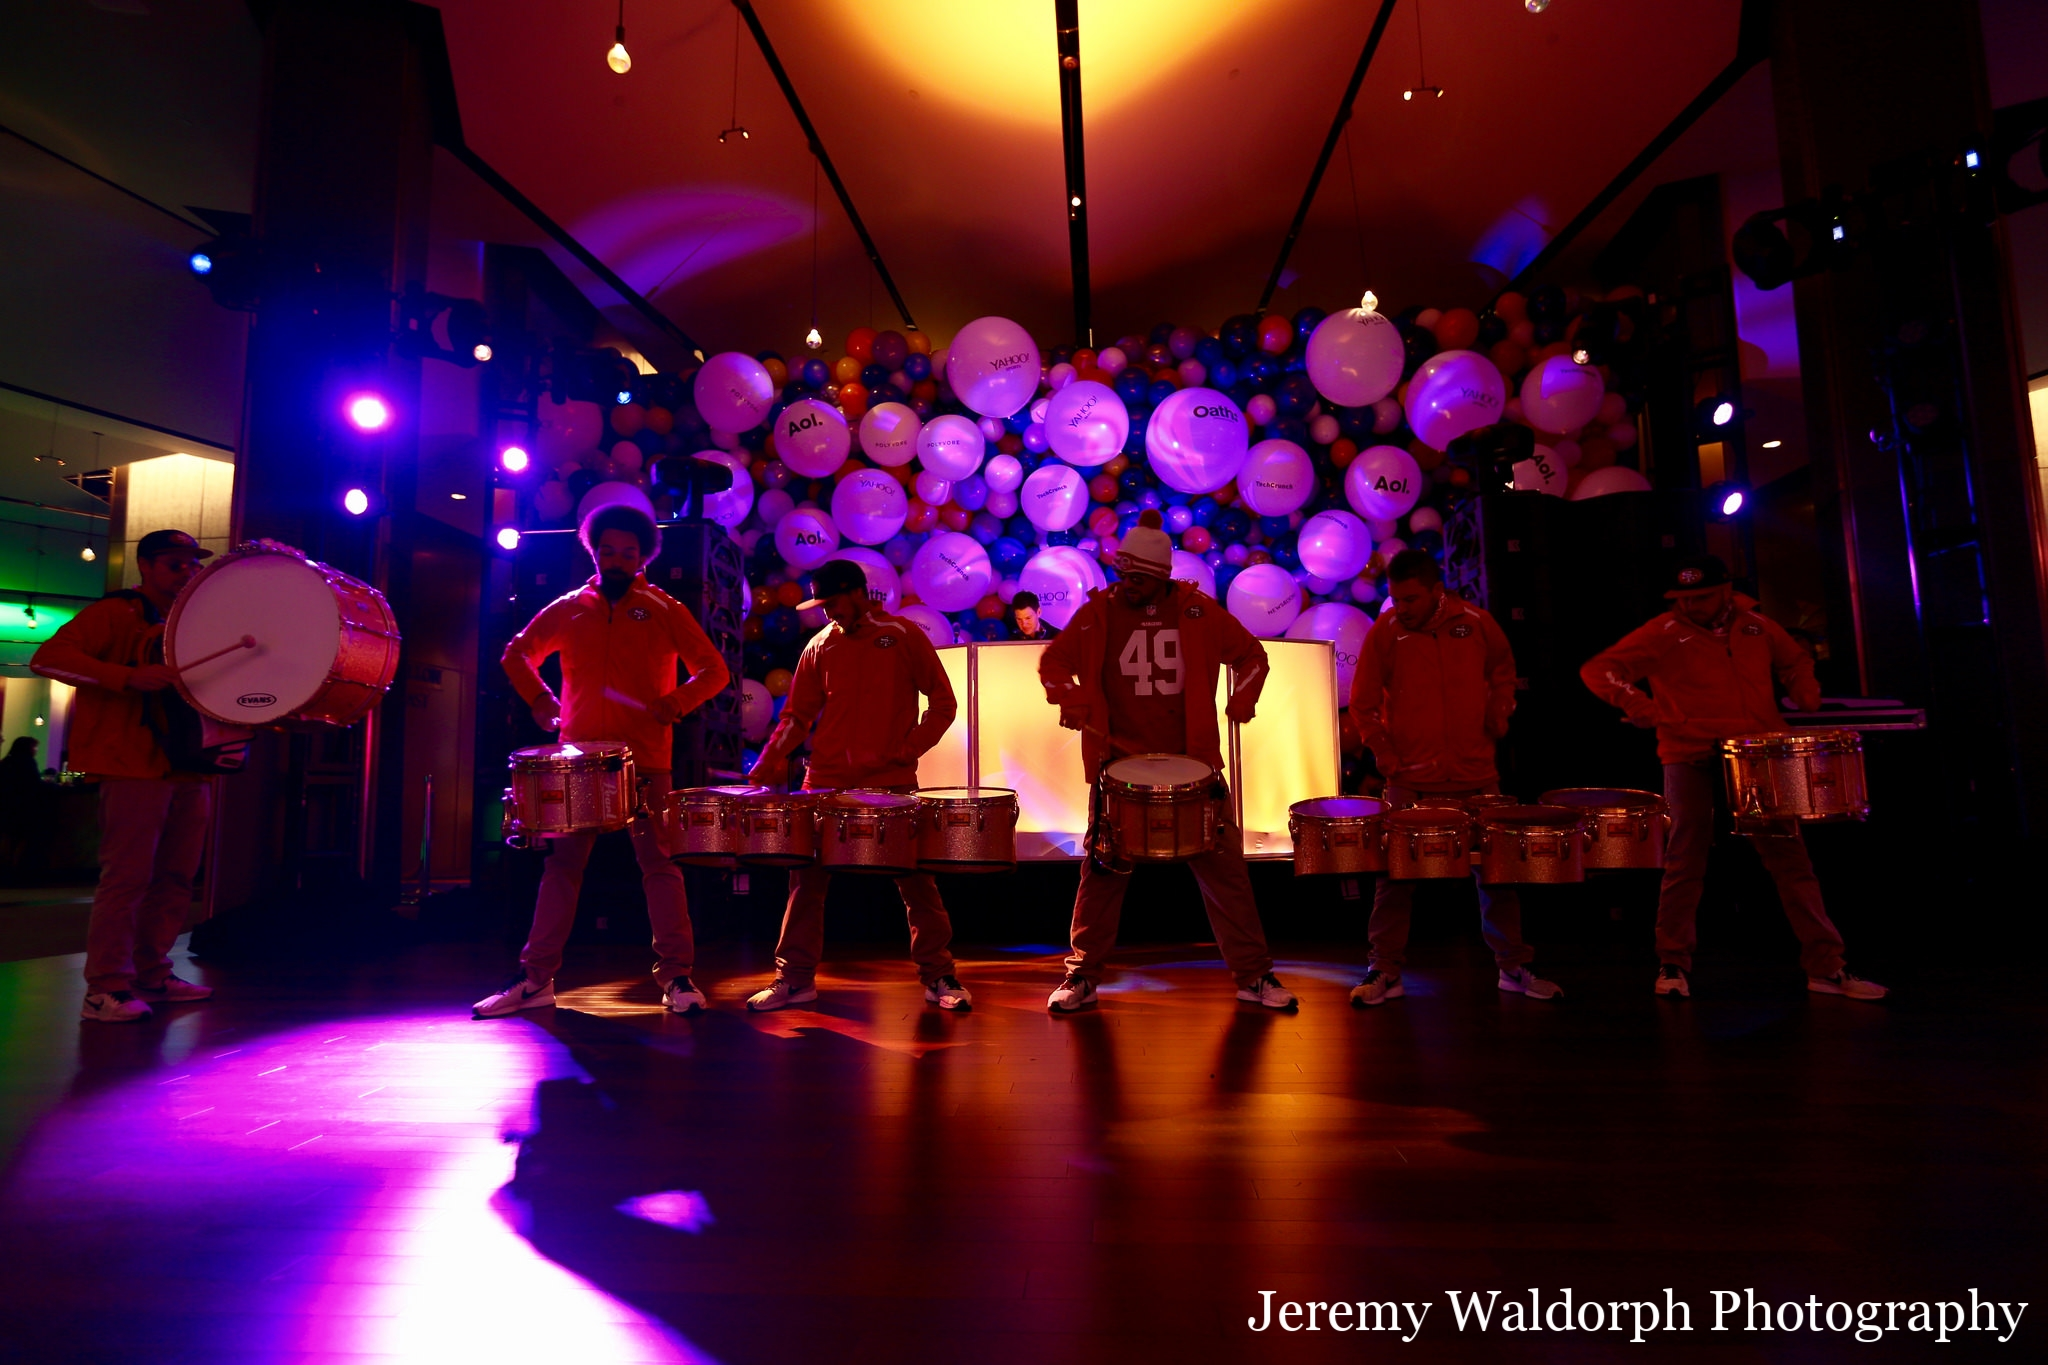 Los Gatos DJ - Oath YEP Holiday Party 2017 - SF 49ers Drumline - Jeremy Waldorph Photo.jpg